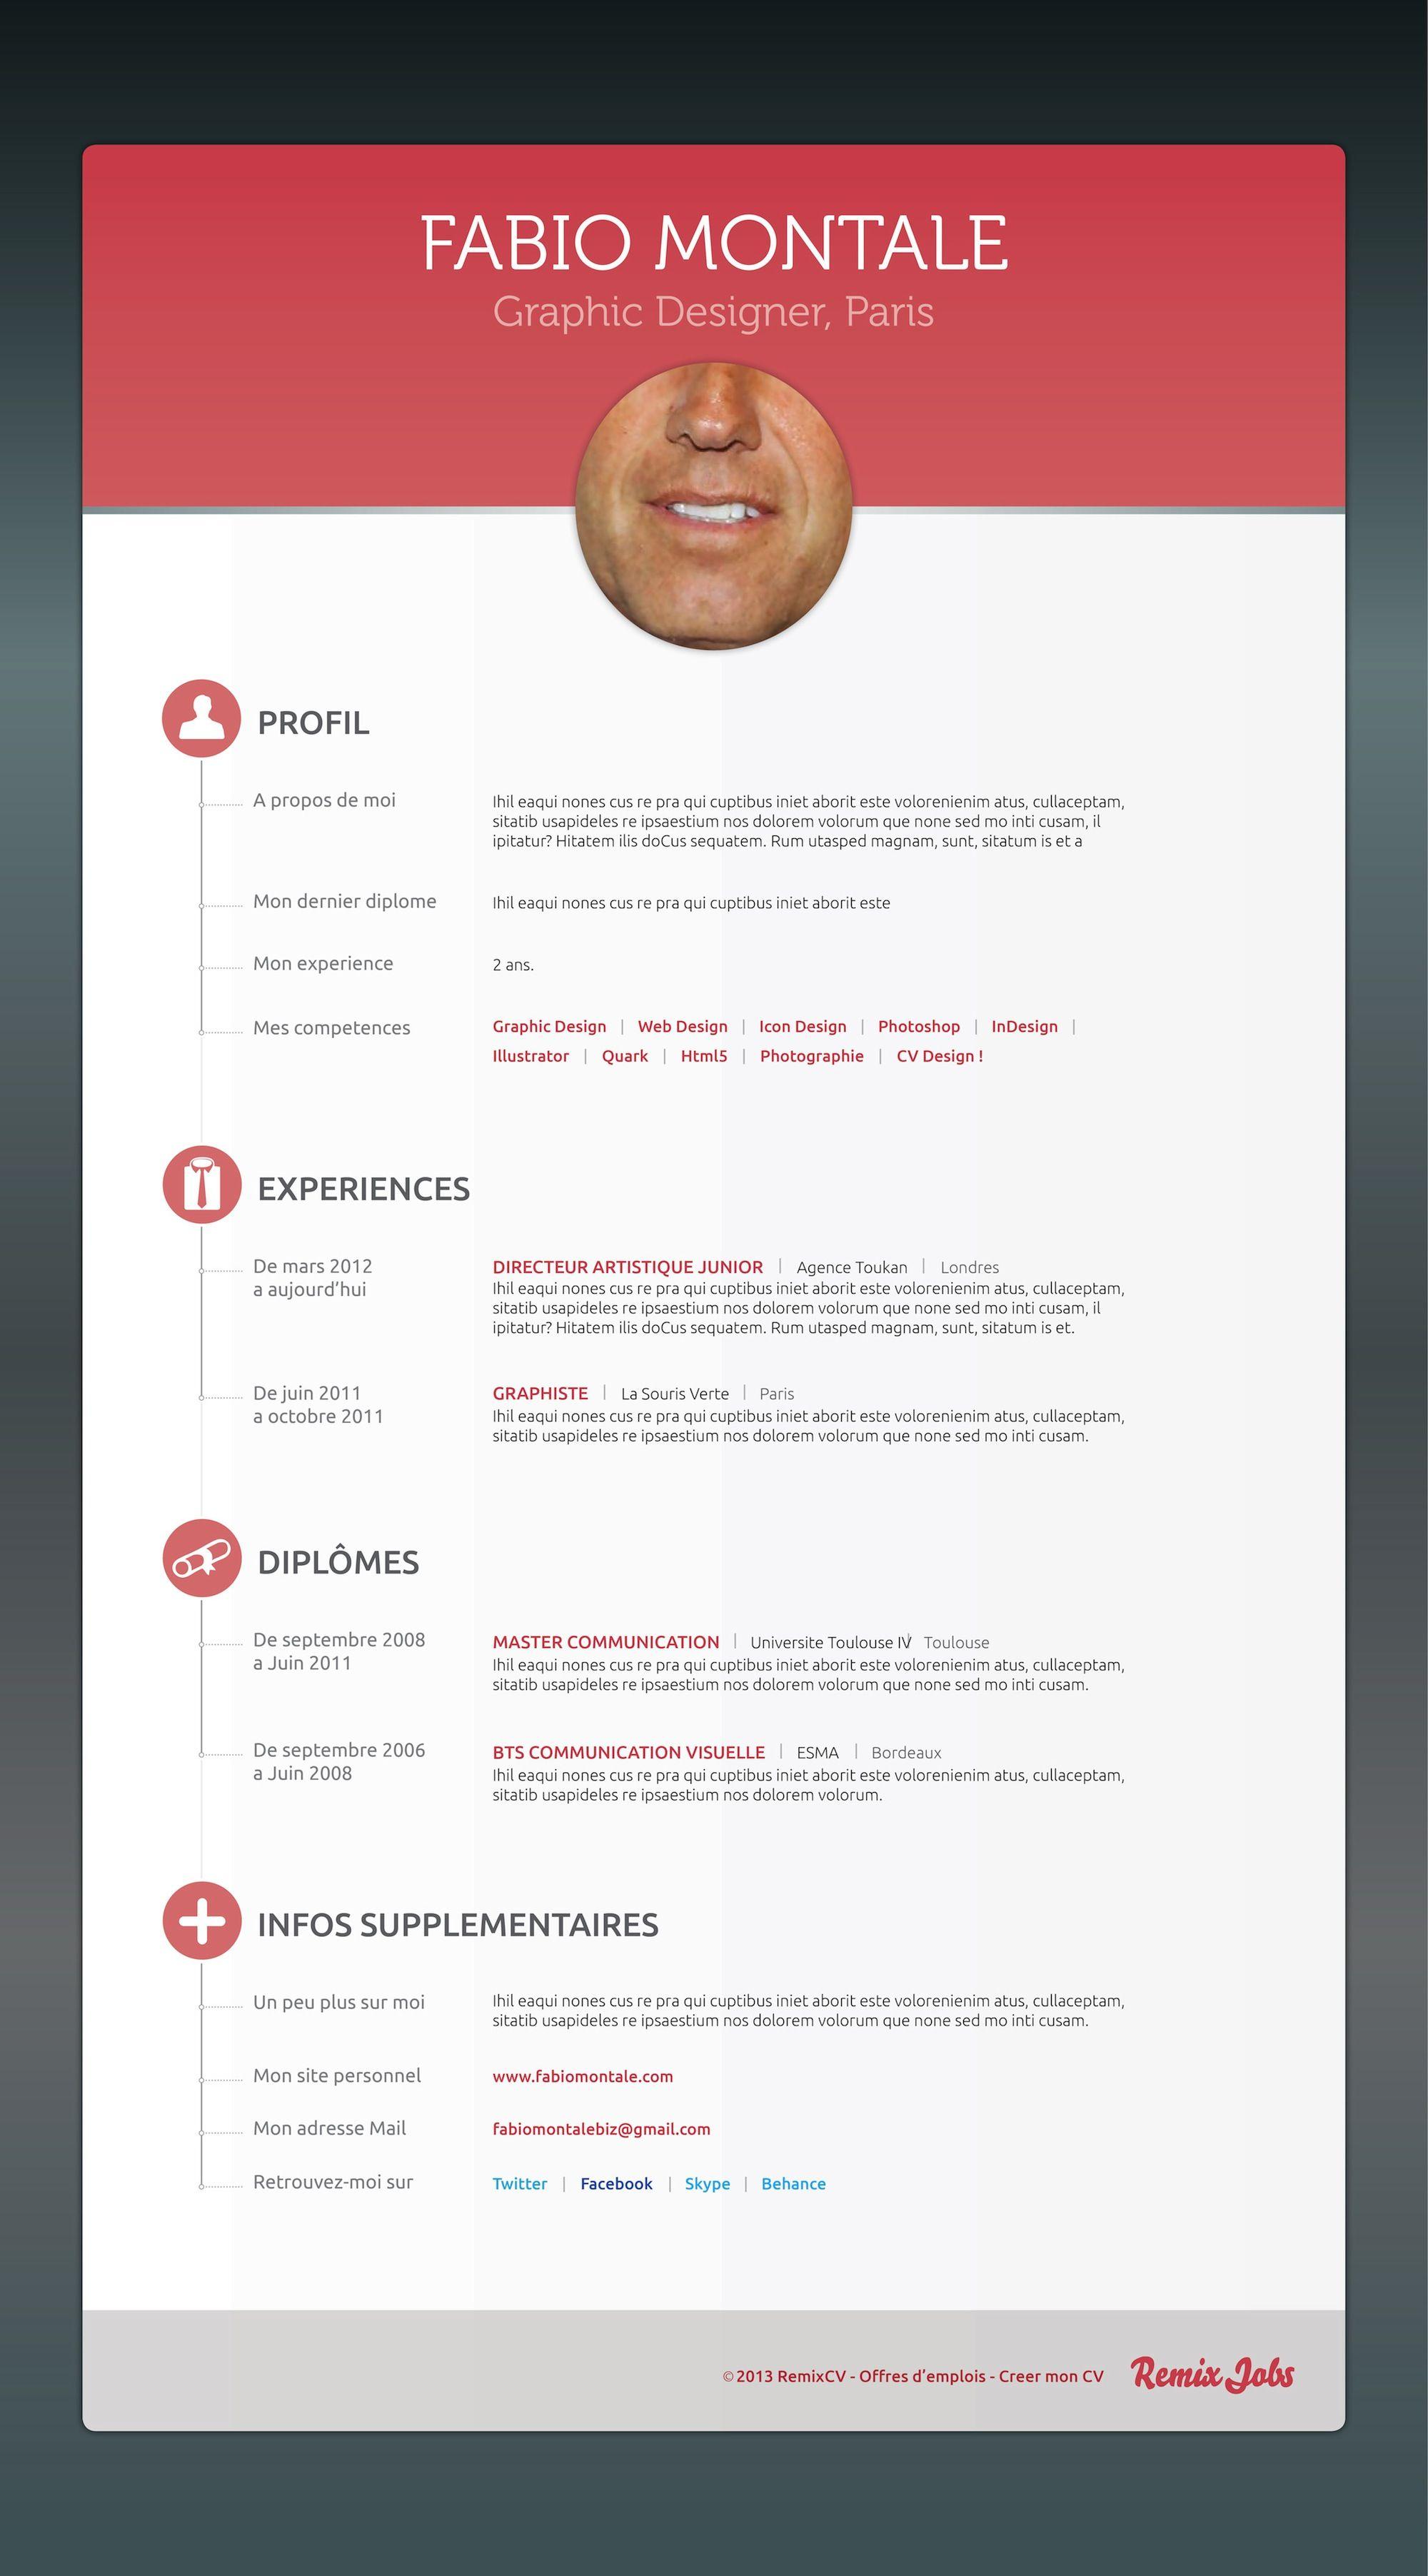 Http Remixjobs Com Blog Wp Content Uploads 2013 07 Fabio Montale Web Jpg Cv Creatif Offre Emploi Graphic Designer